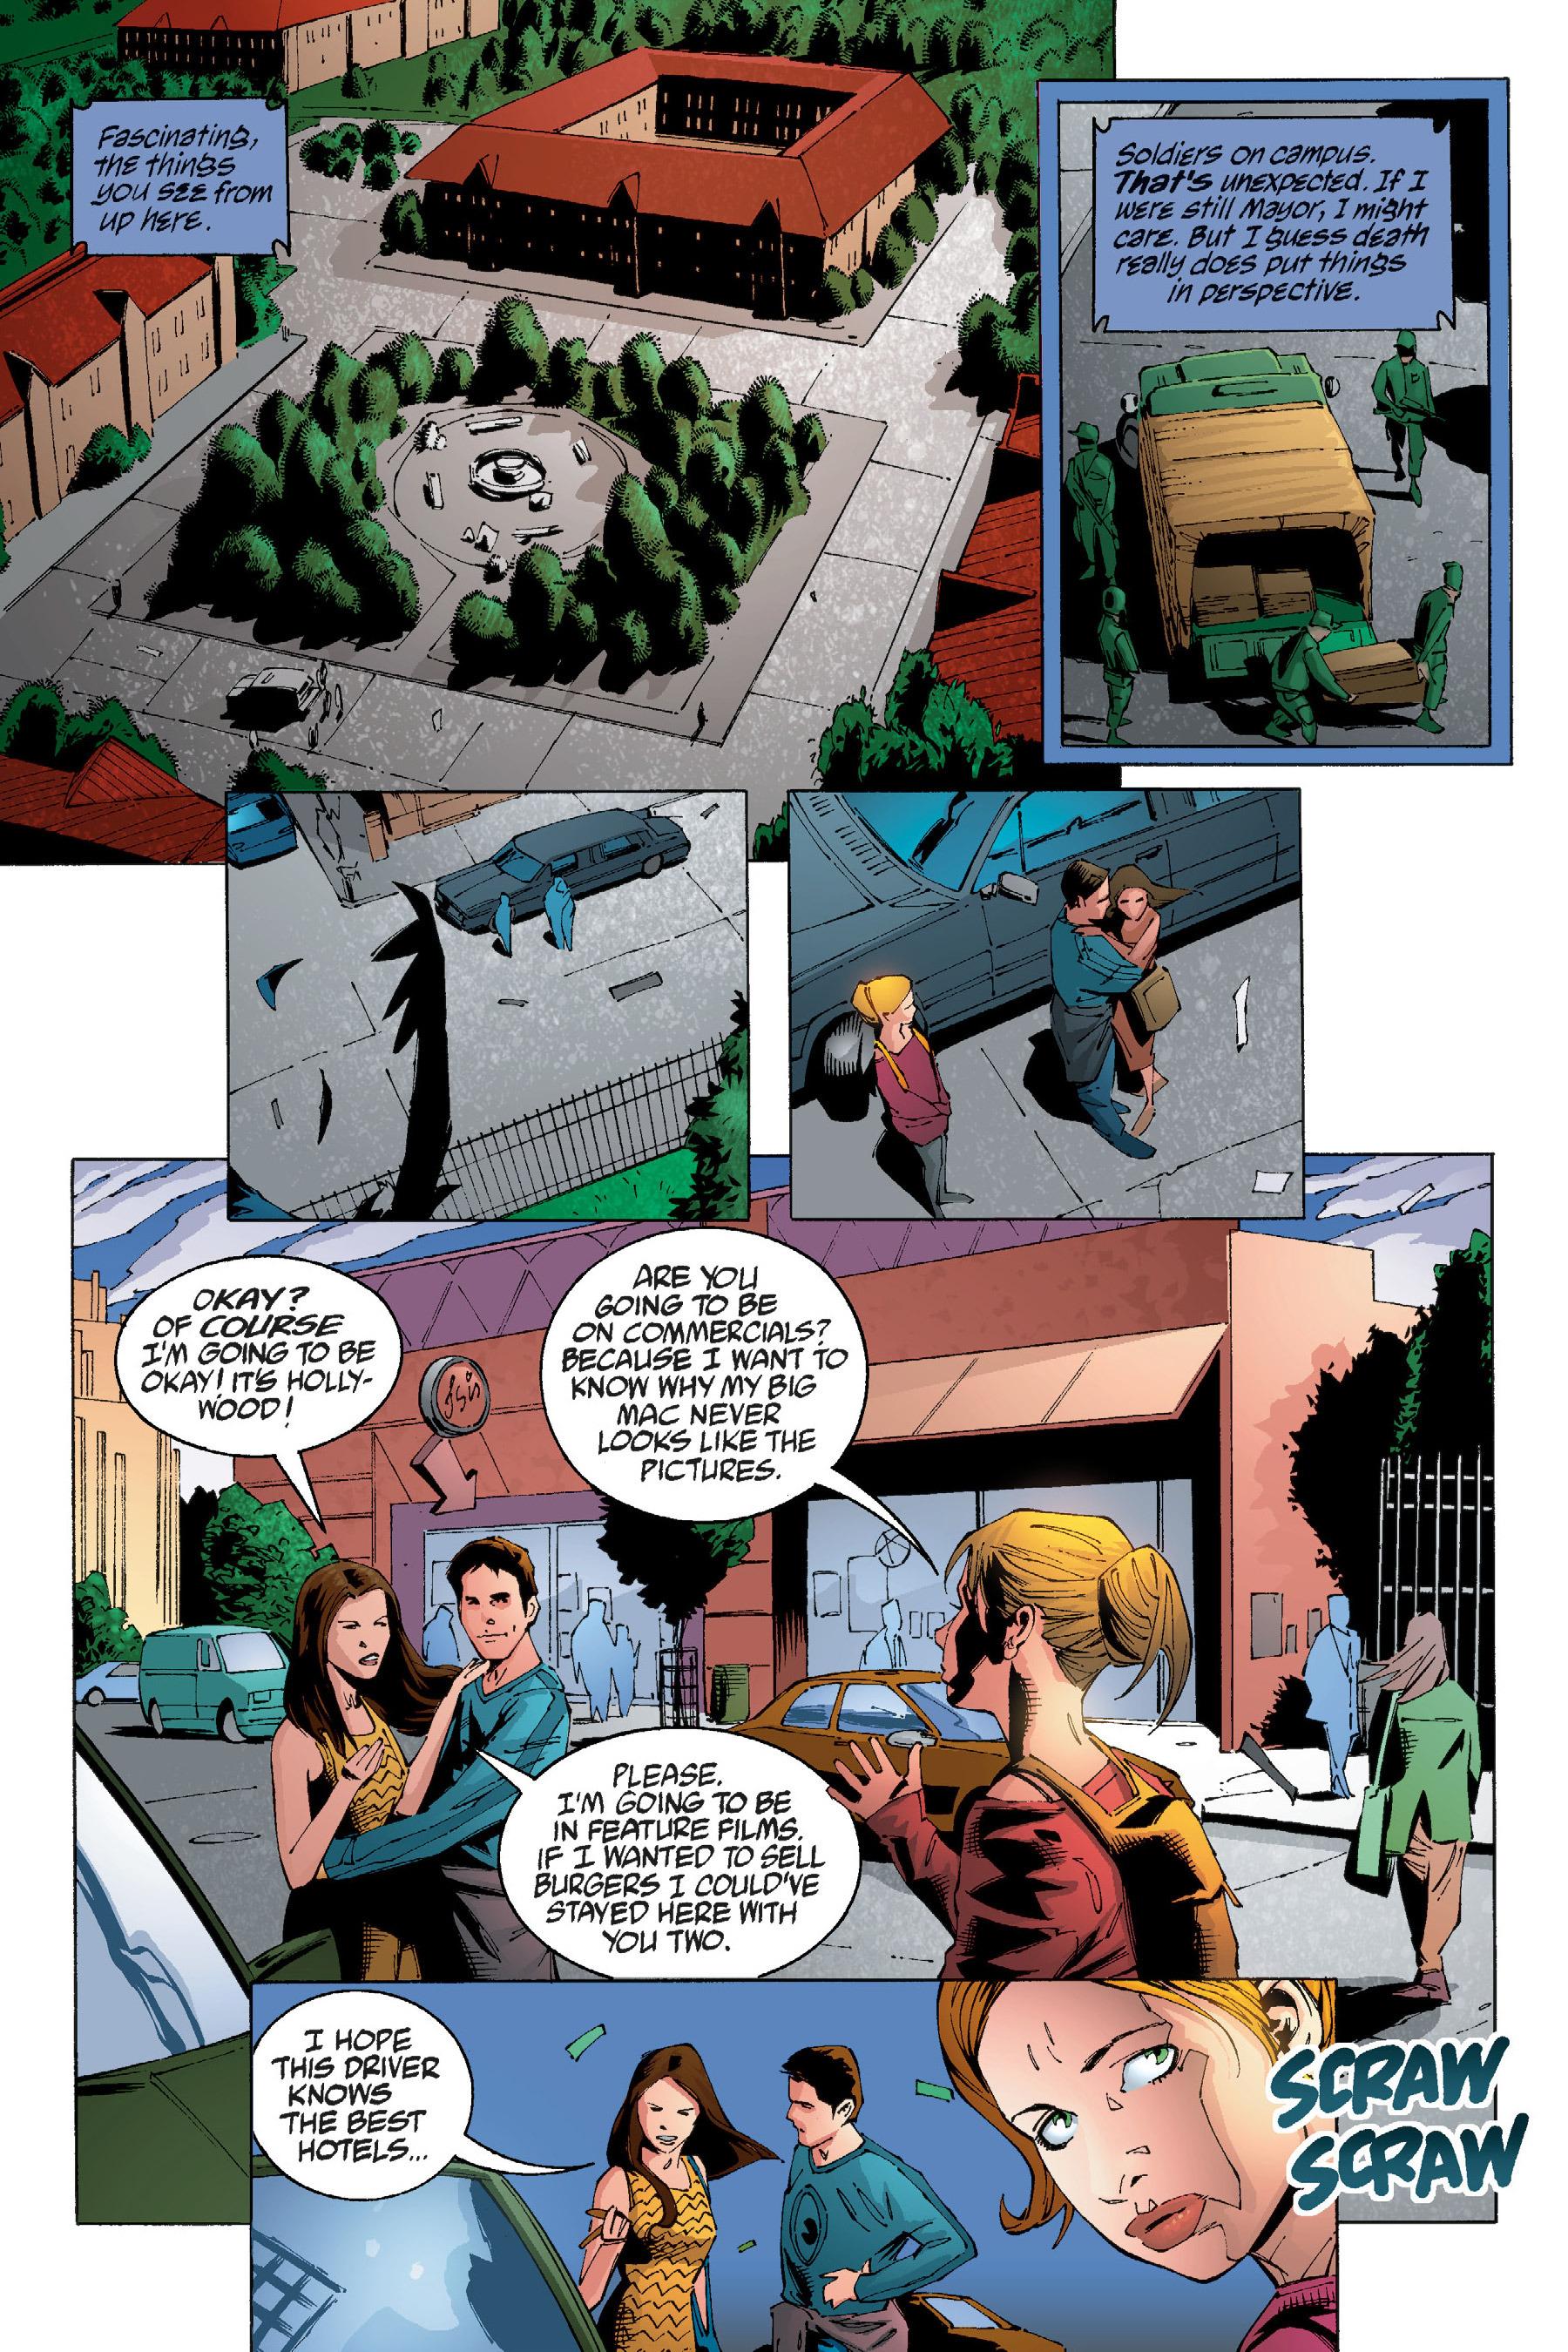 Read online Buffy the Vampire Slayer: Omnibus comic -  Issue # TPB 5 - 18